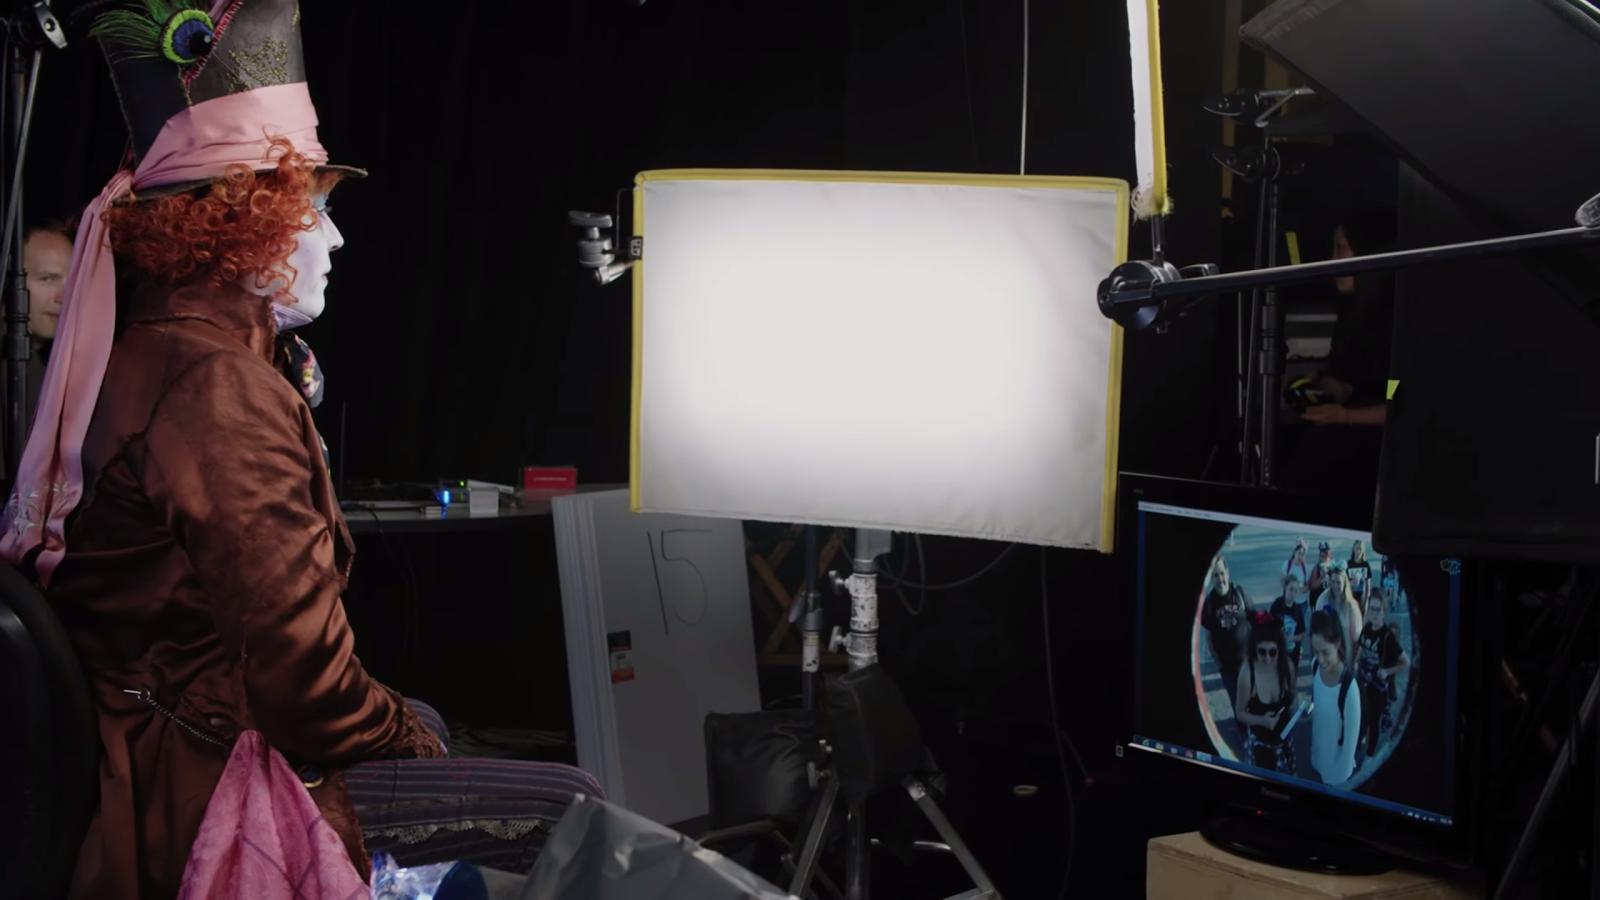 Google chrome themes johnny depp - Denizen Johnny Depp Bring Mad Hatter Poster To Life For Disney S Alice Through The